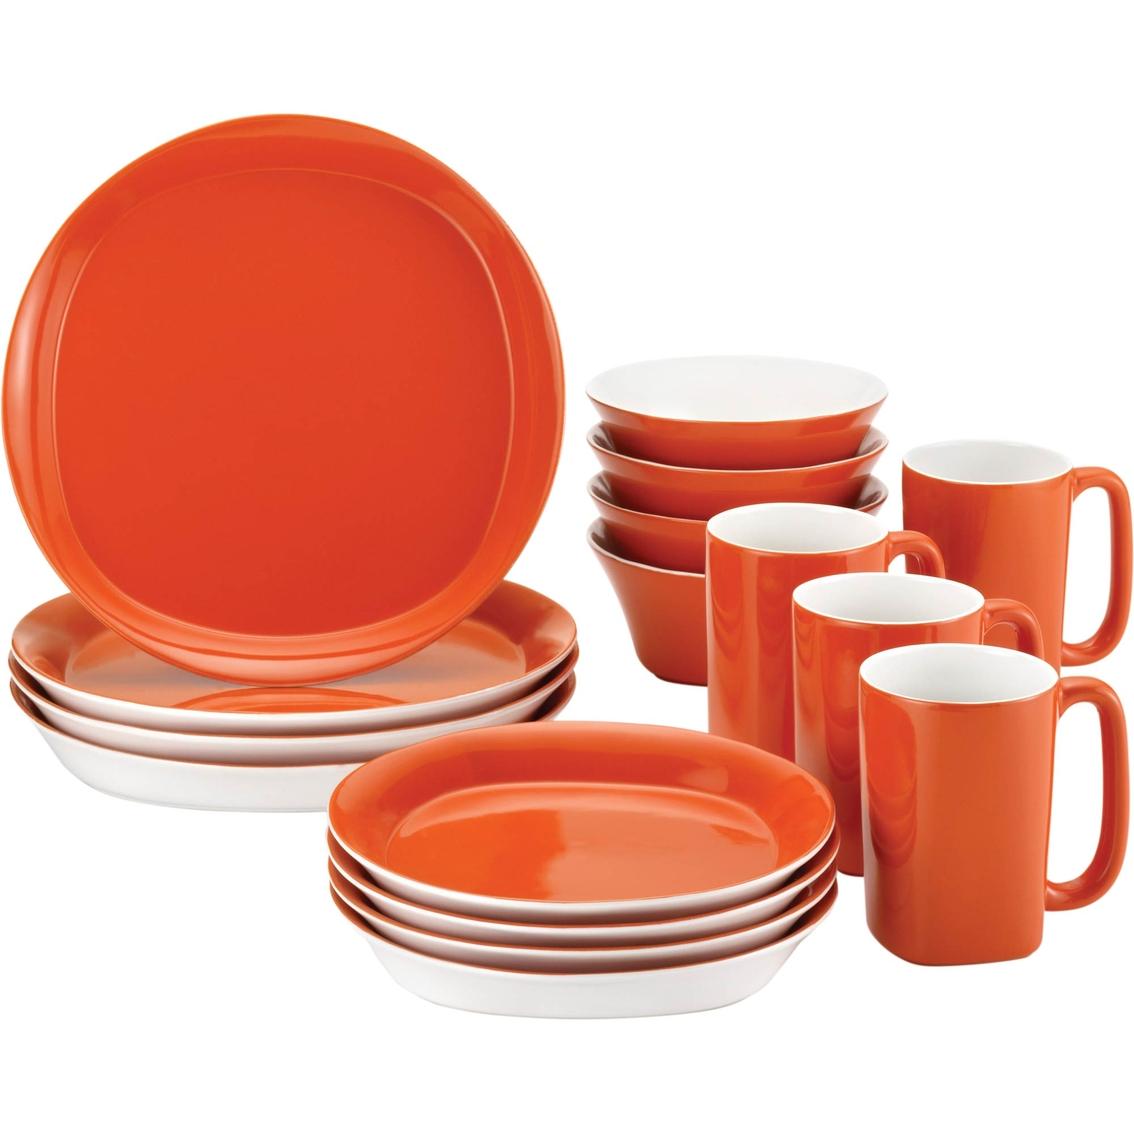 Rachael Ray Round And Square 16 Pc Tangerine Stoneware  : 50888882294 from www.shopmyexchange.com size 1134 x 1134 jpeg 343kB